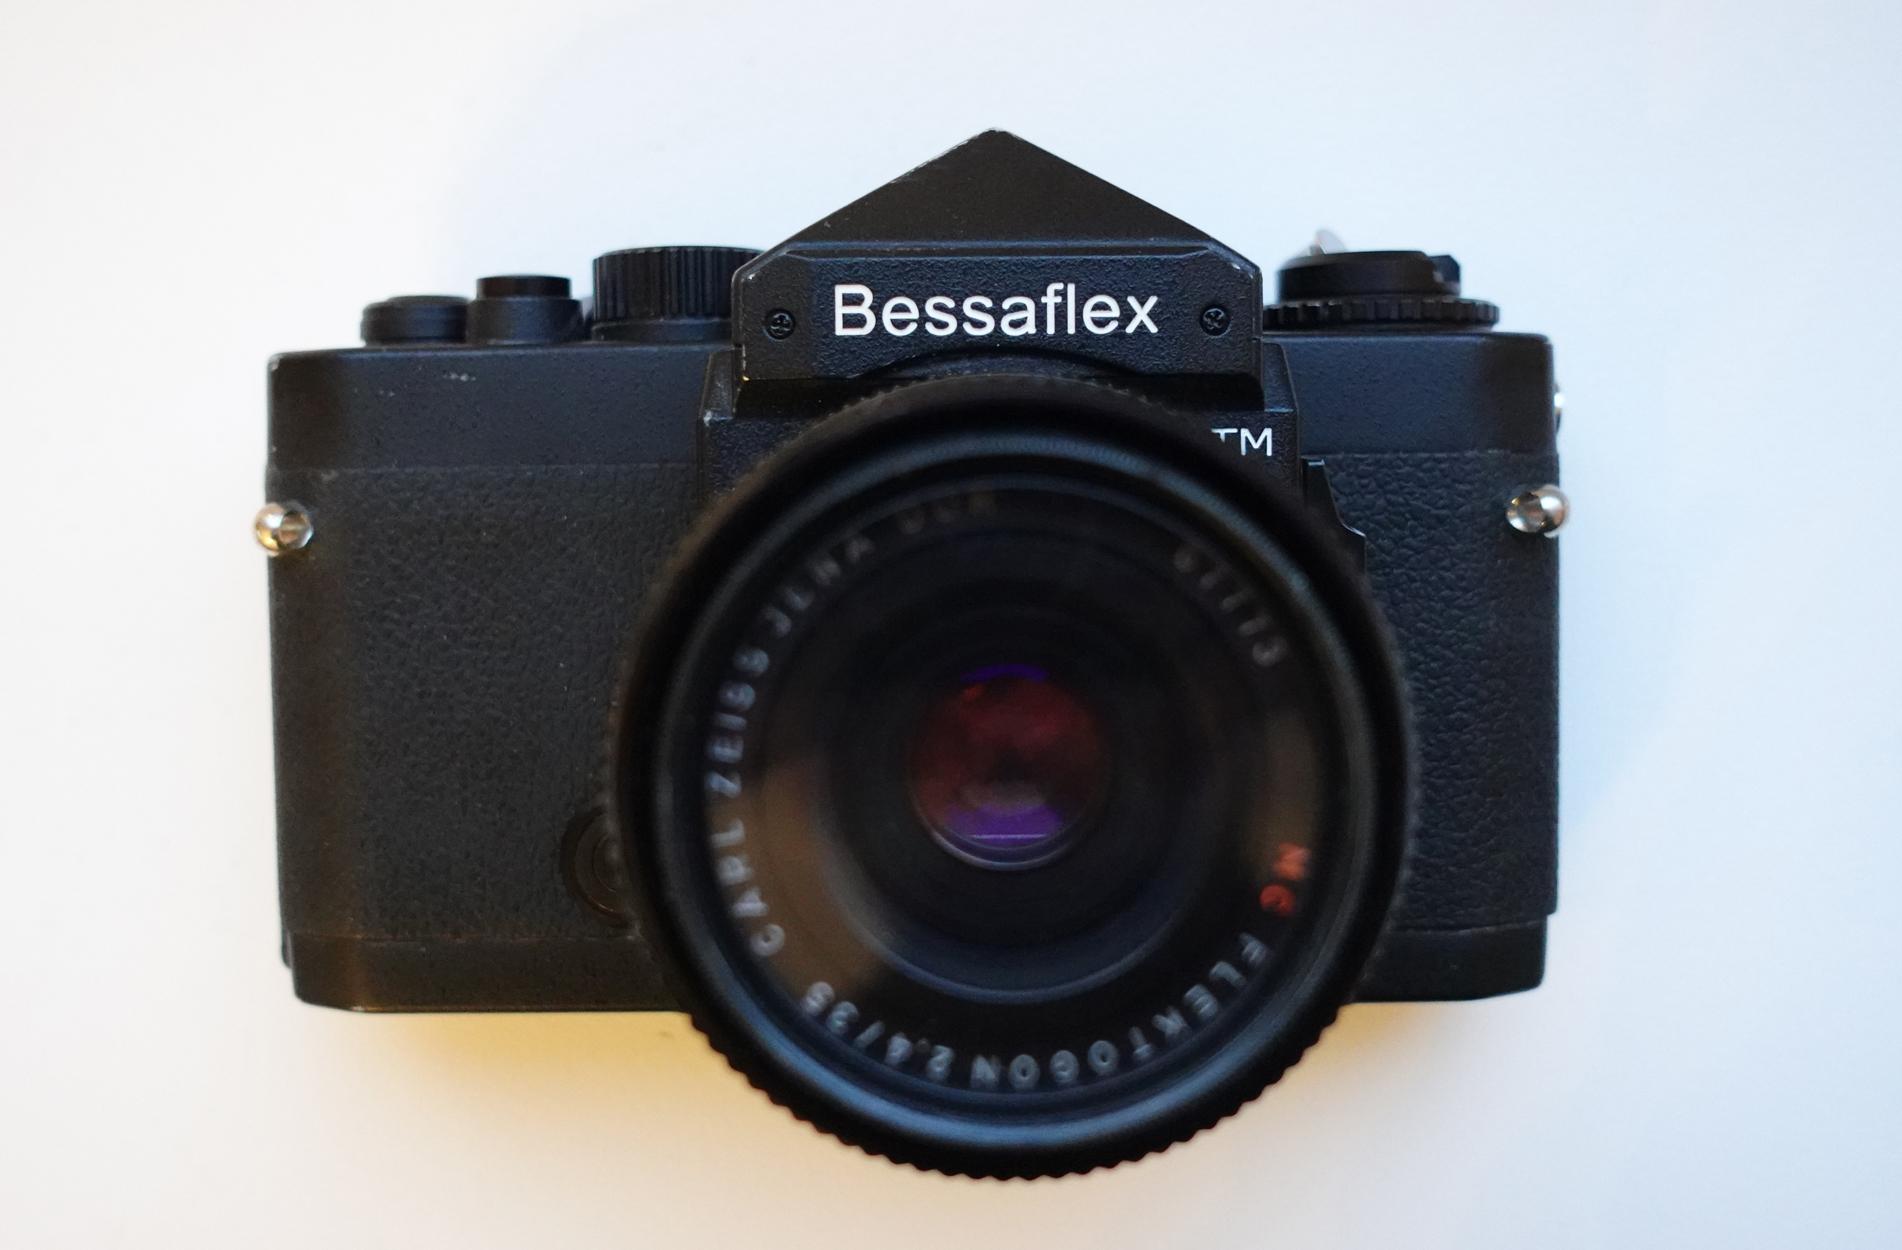 Voigtlander Bessaflex TM (Pic: Stephen Dowling)